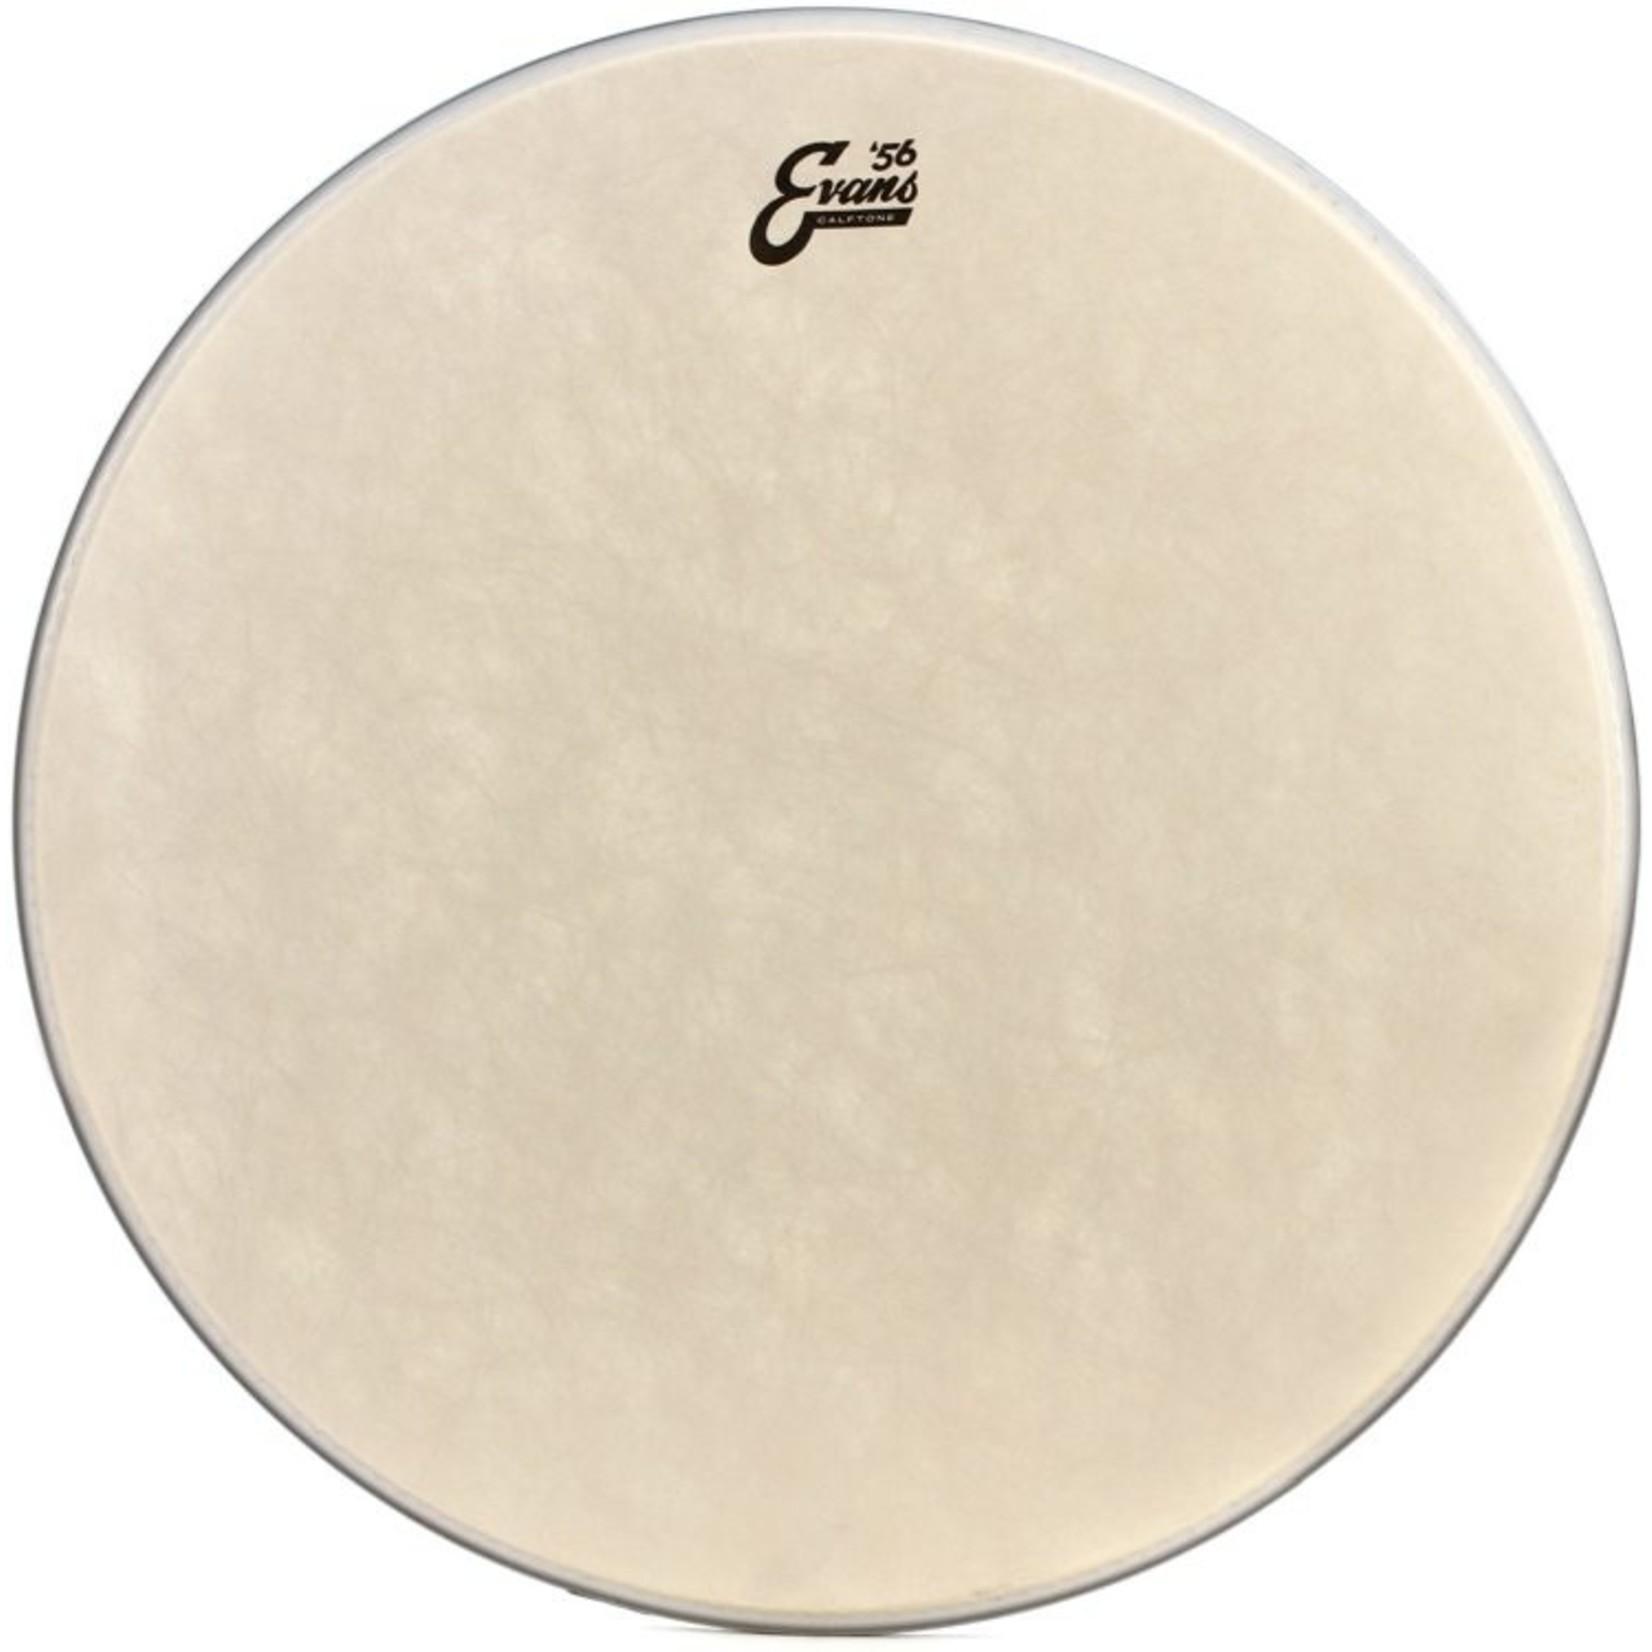 Evans Evans Calftone Bass Drum